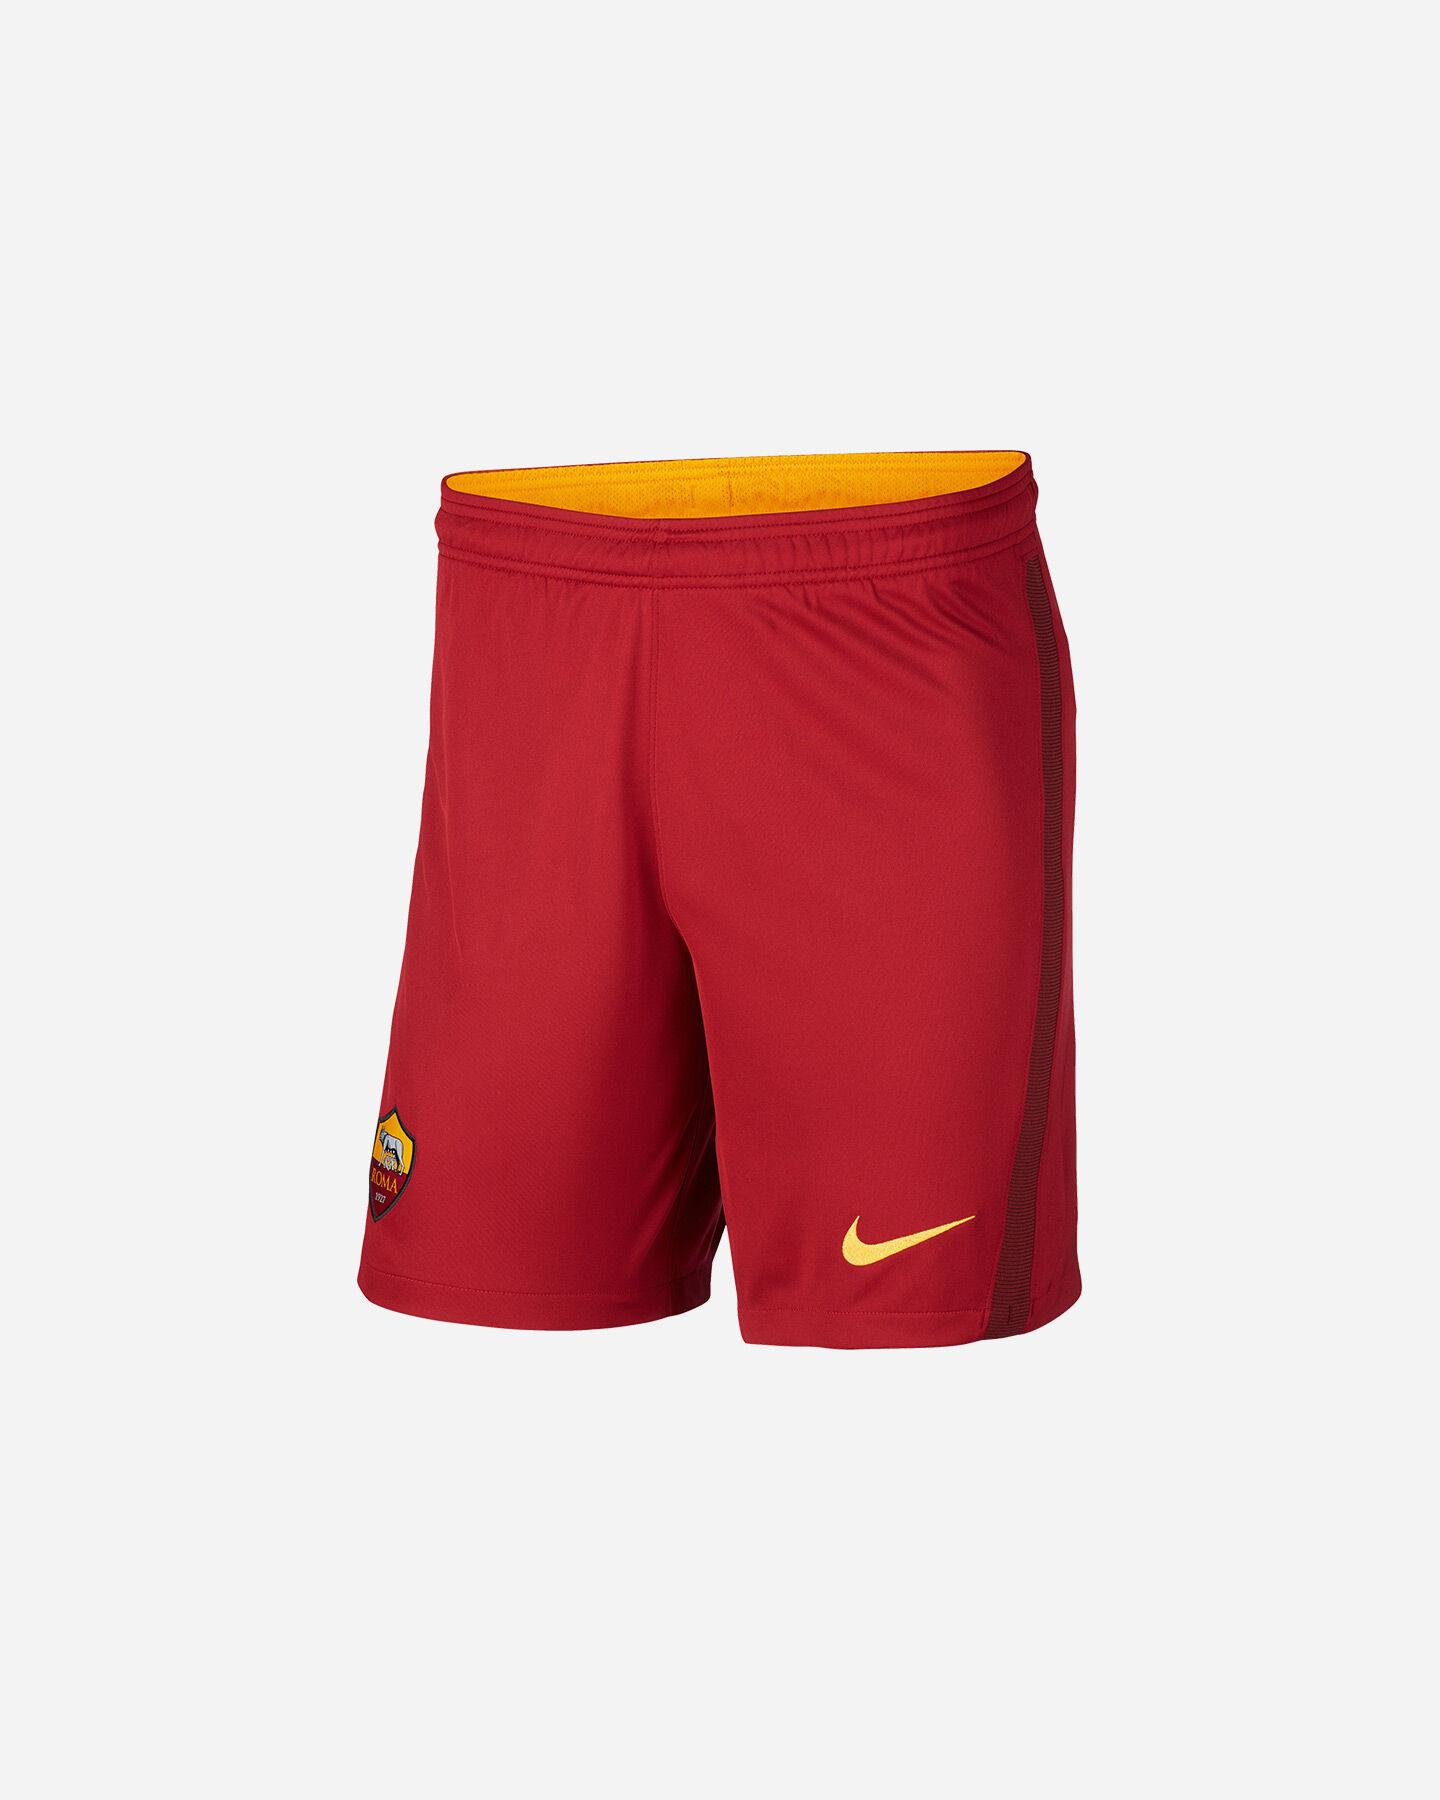 Pantaloncini calcio NIKE AS ROMA HOME 20-21 M S5195448 scatto 0